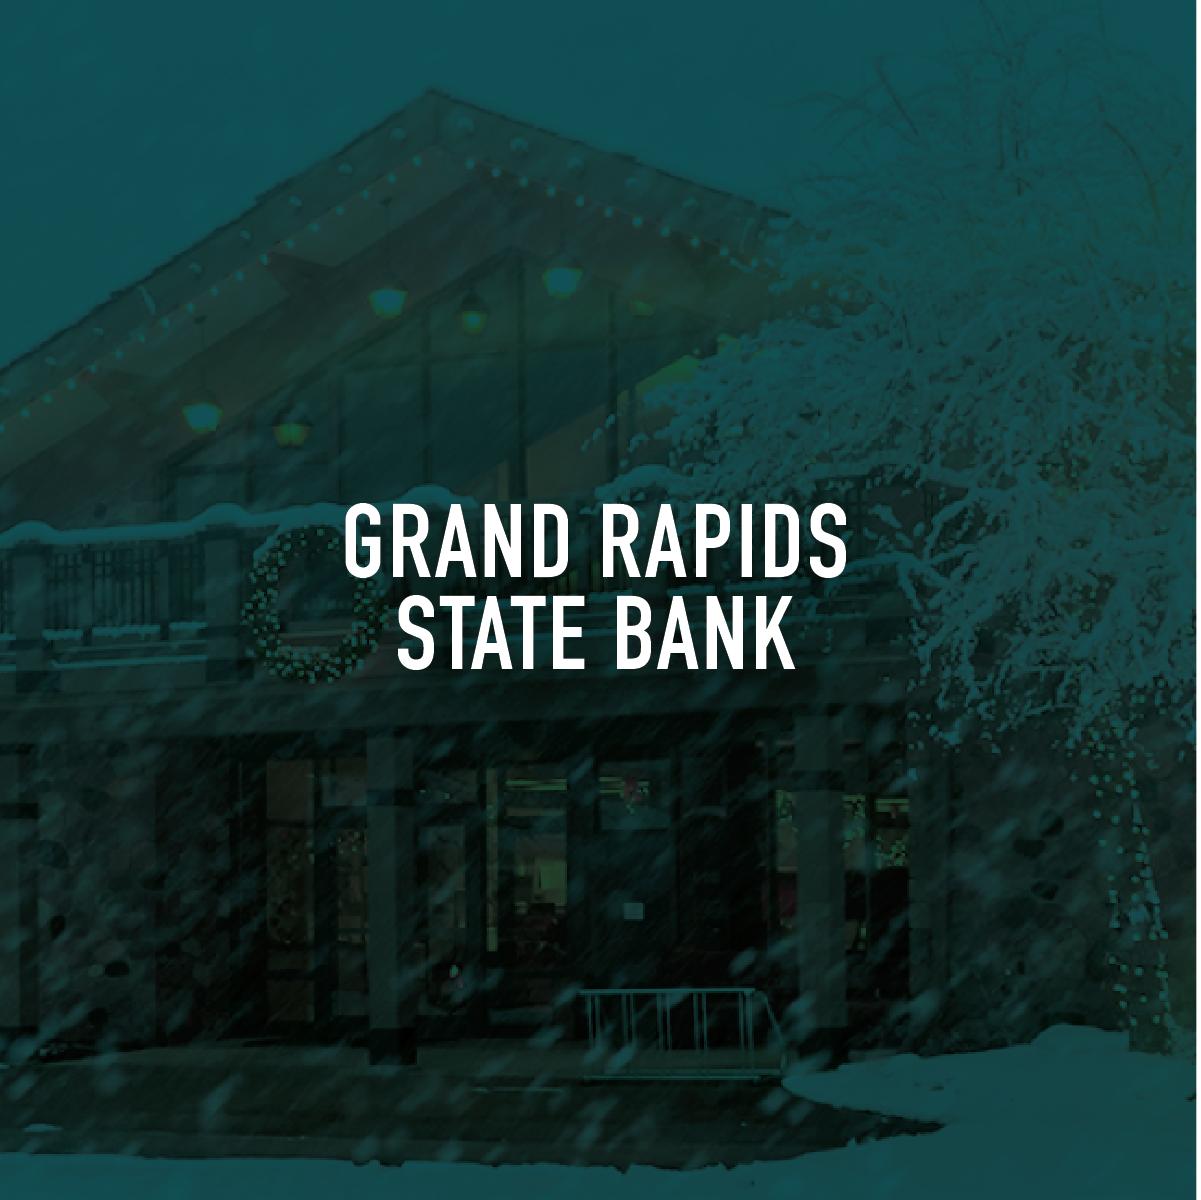 Grand Rapids State Bank Brand Strategy